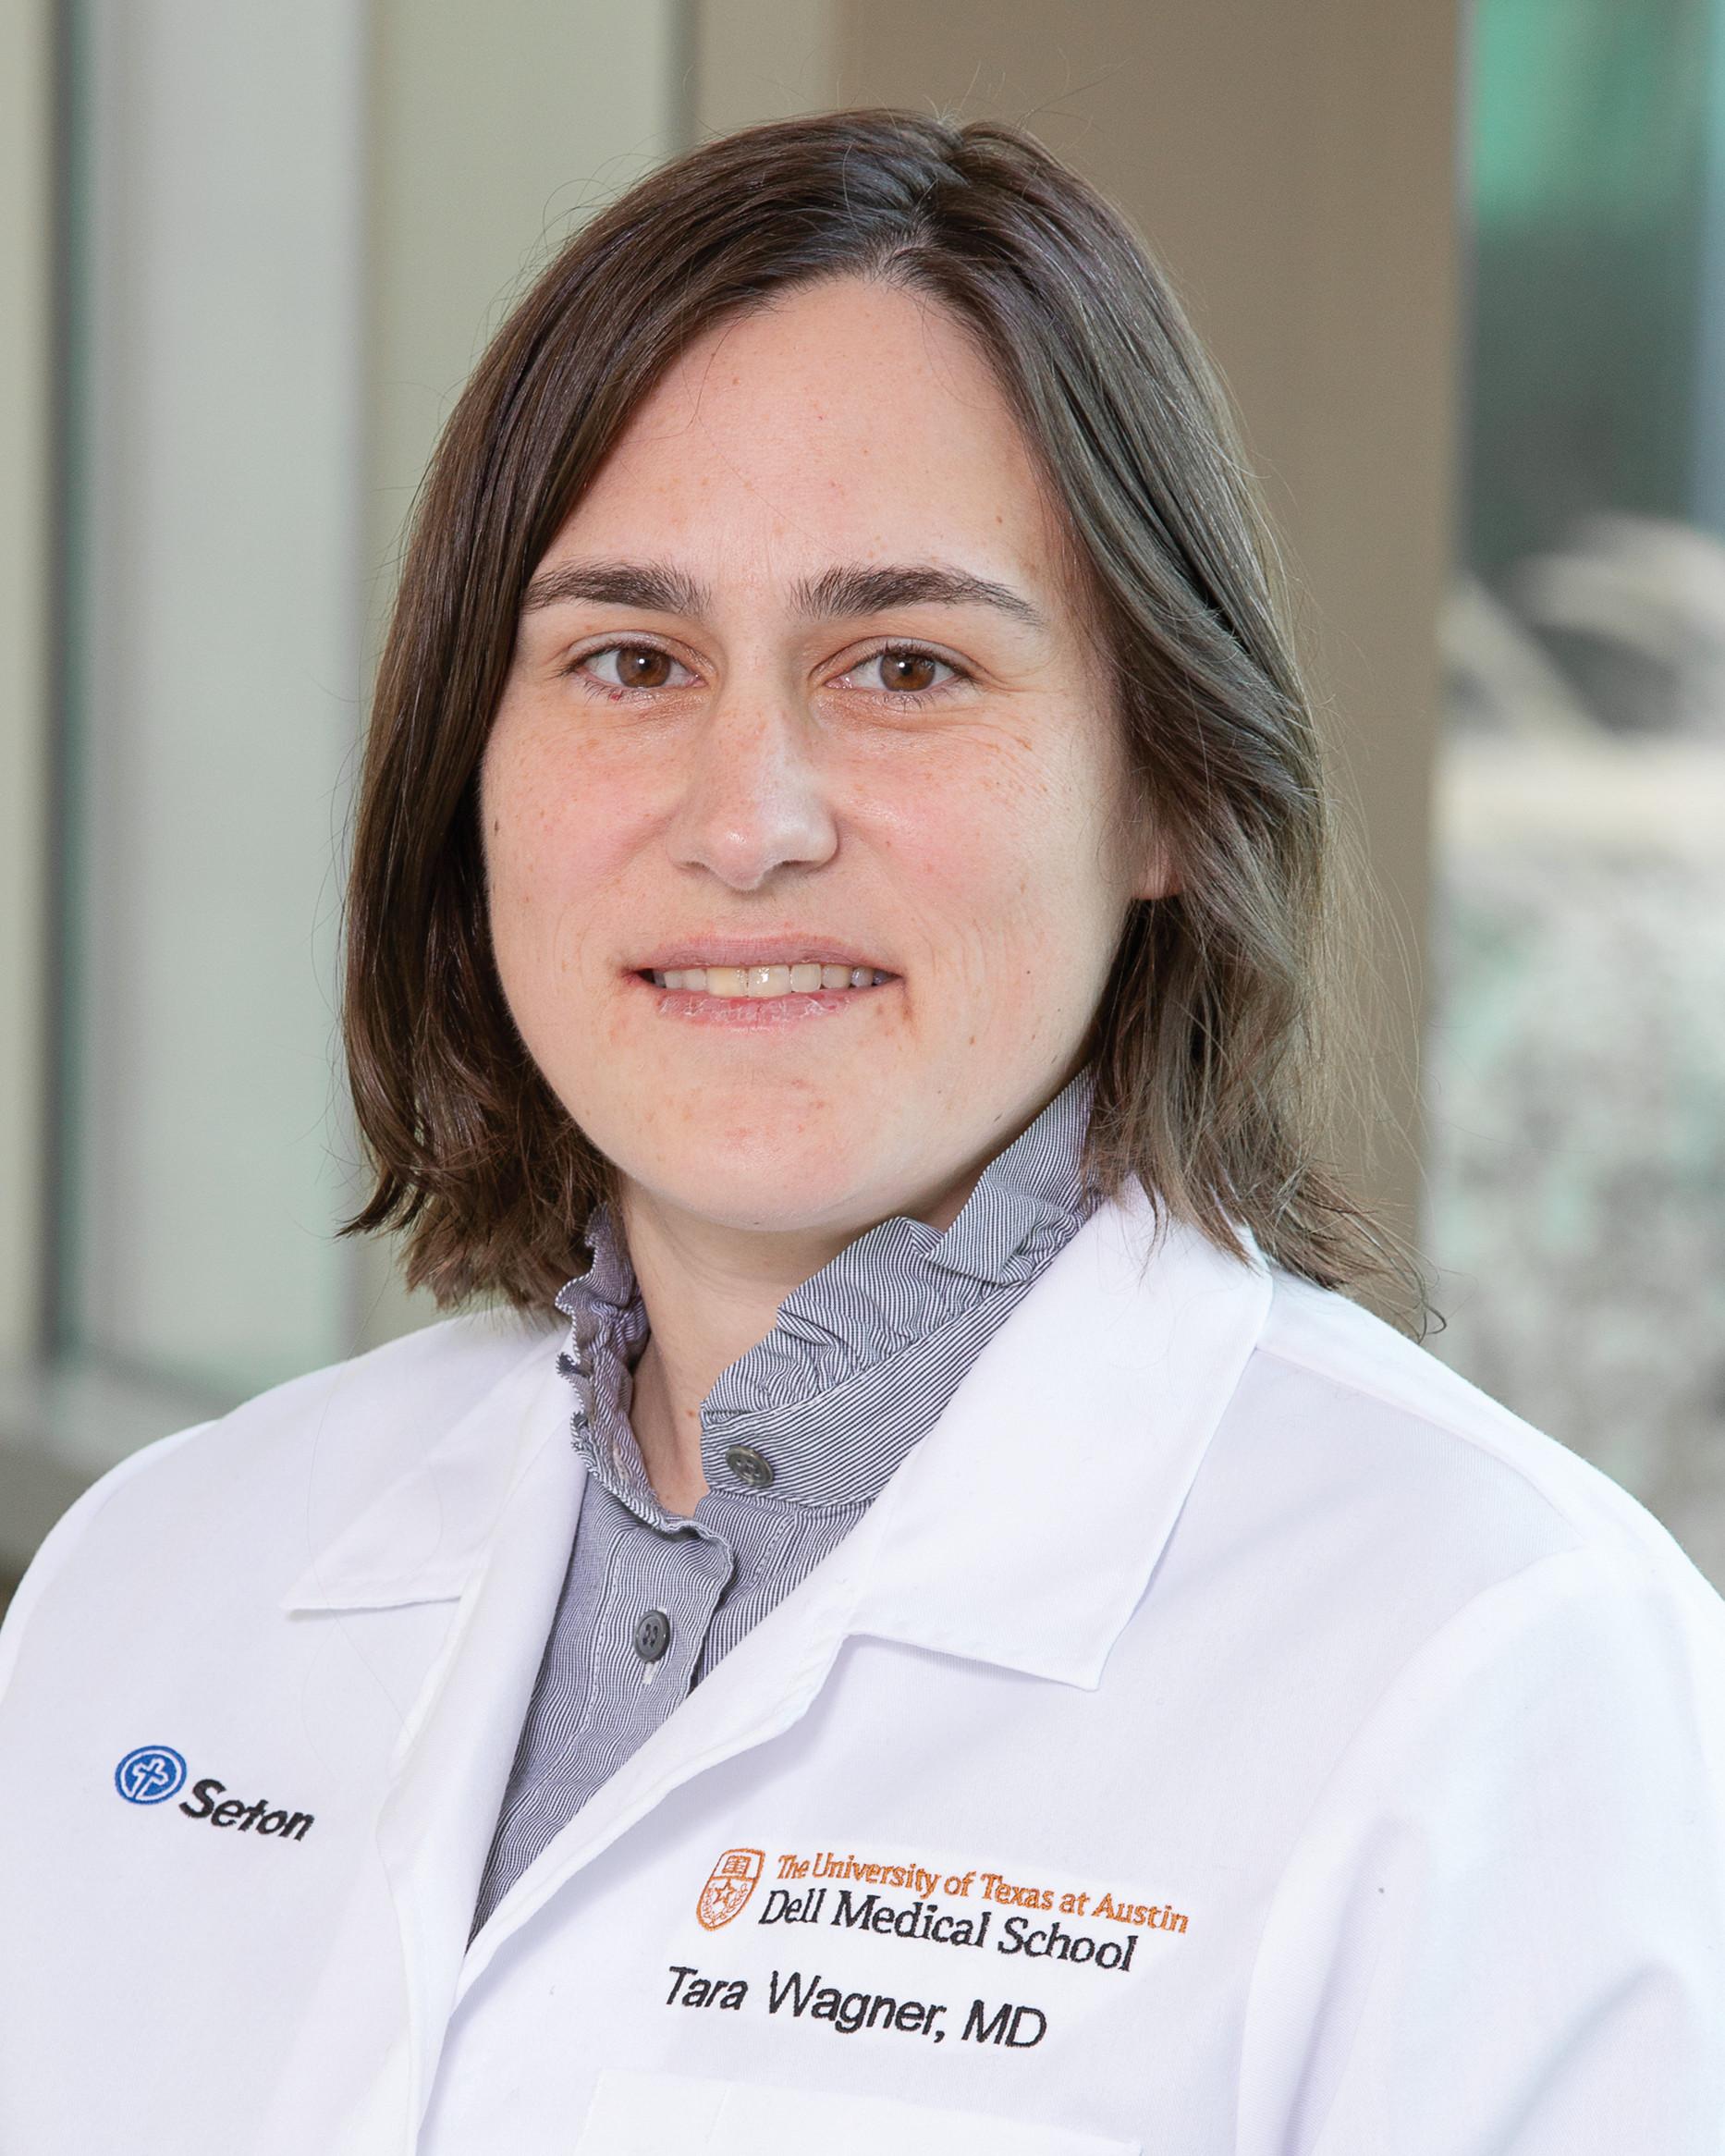 Tara Wagner, MD